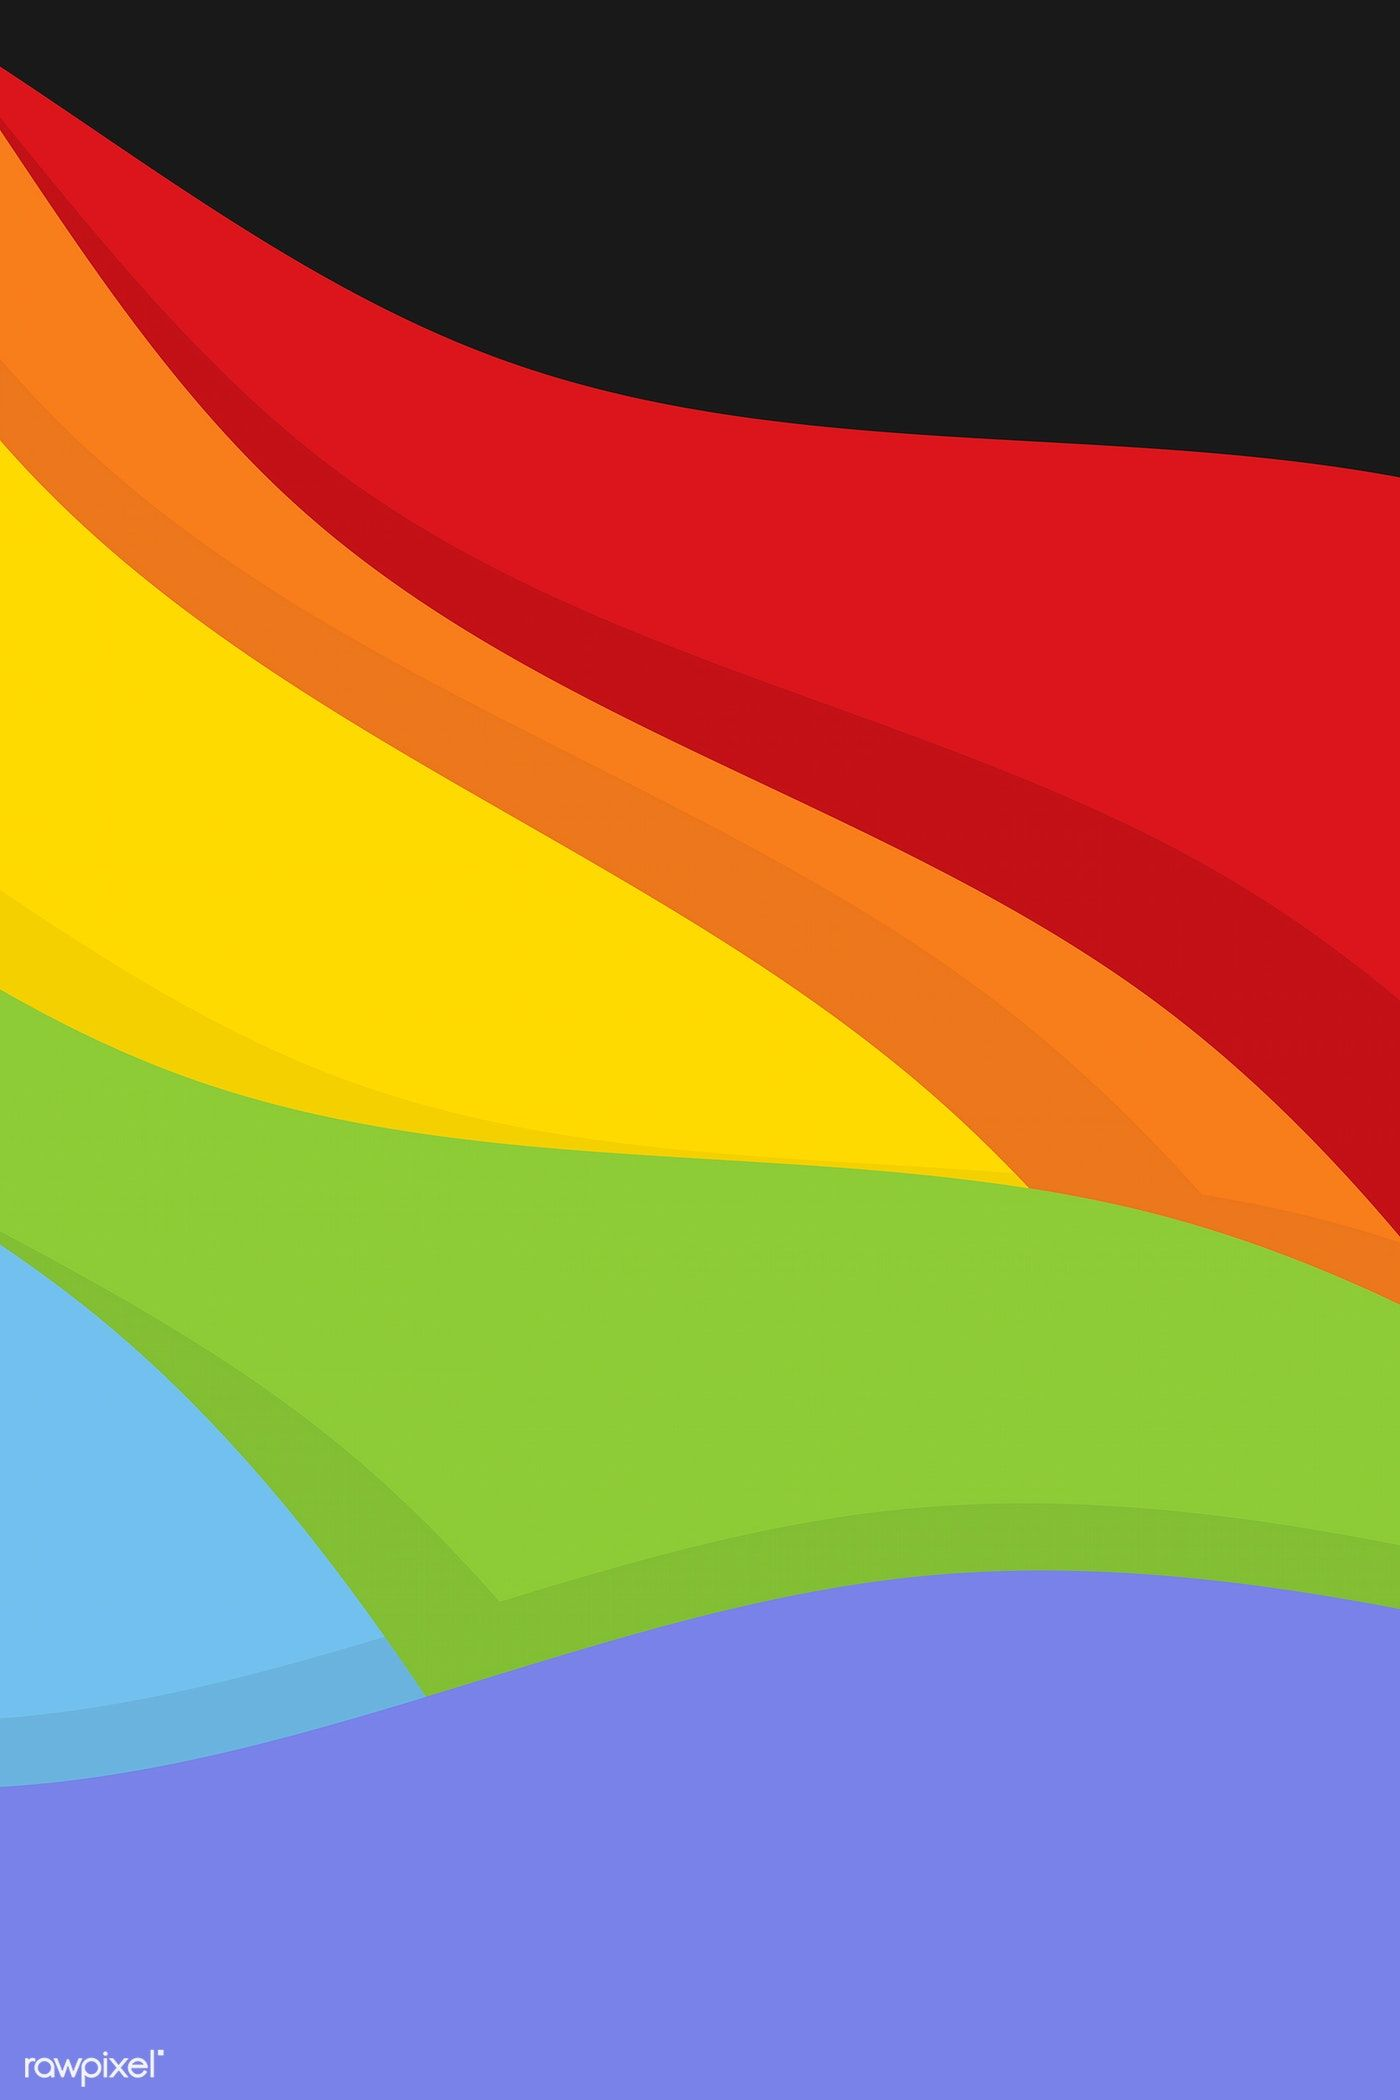 Download Premium Vector Of Support Lgbtq Pride Rainbow Background Vector Rainbow Background Lgbtq Pride Rainbow Pride